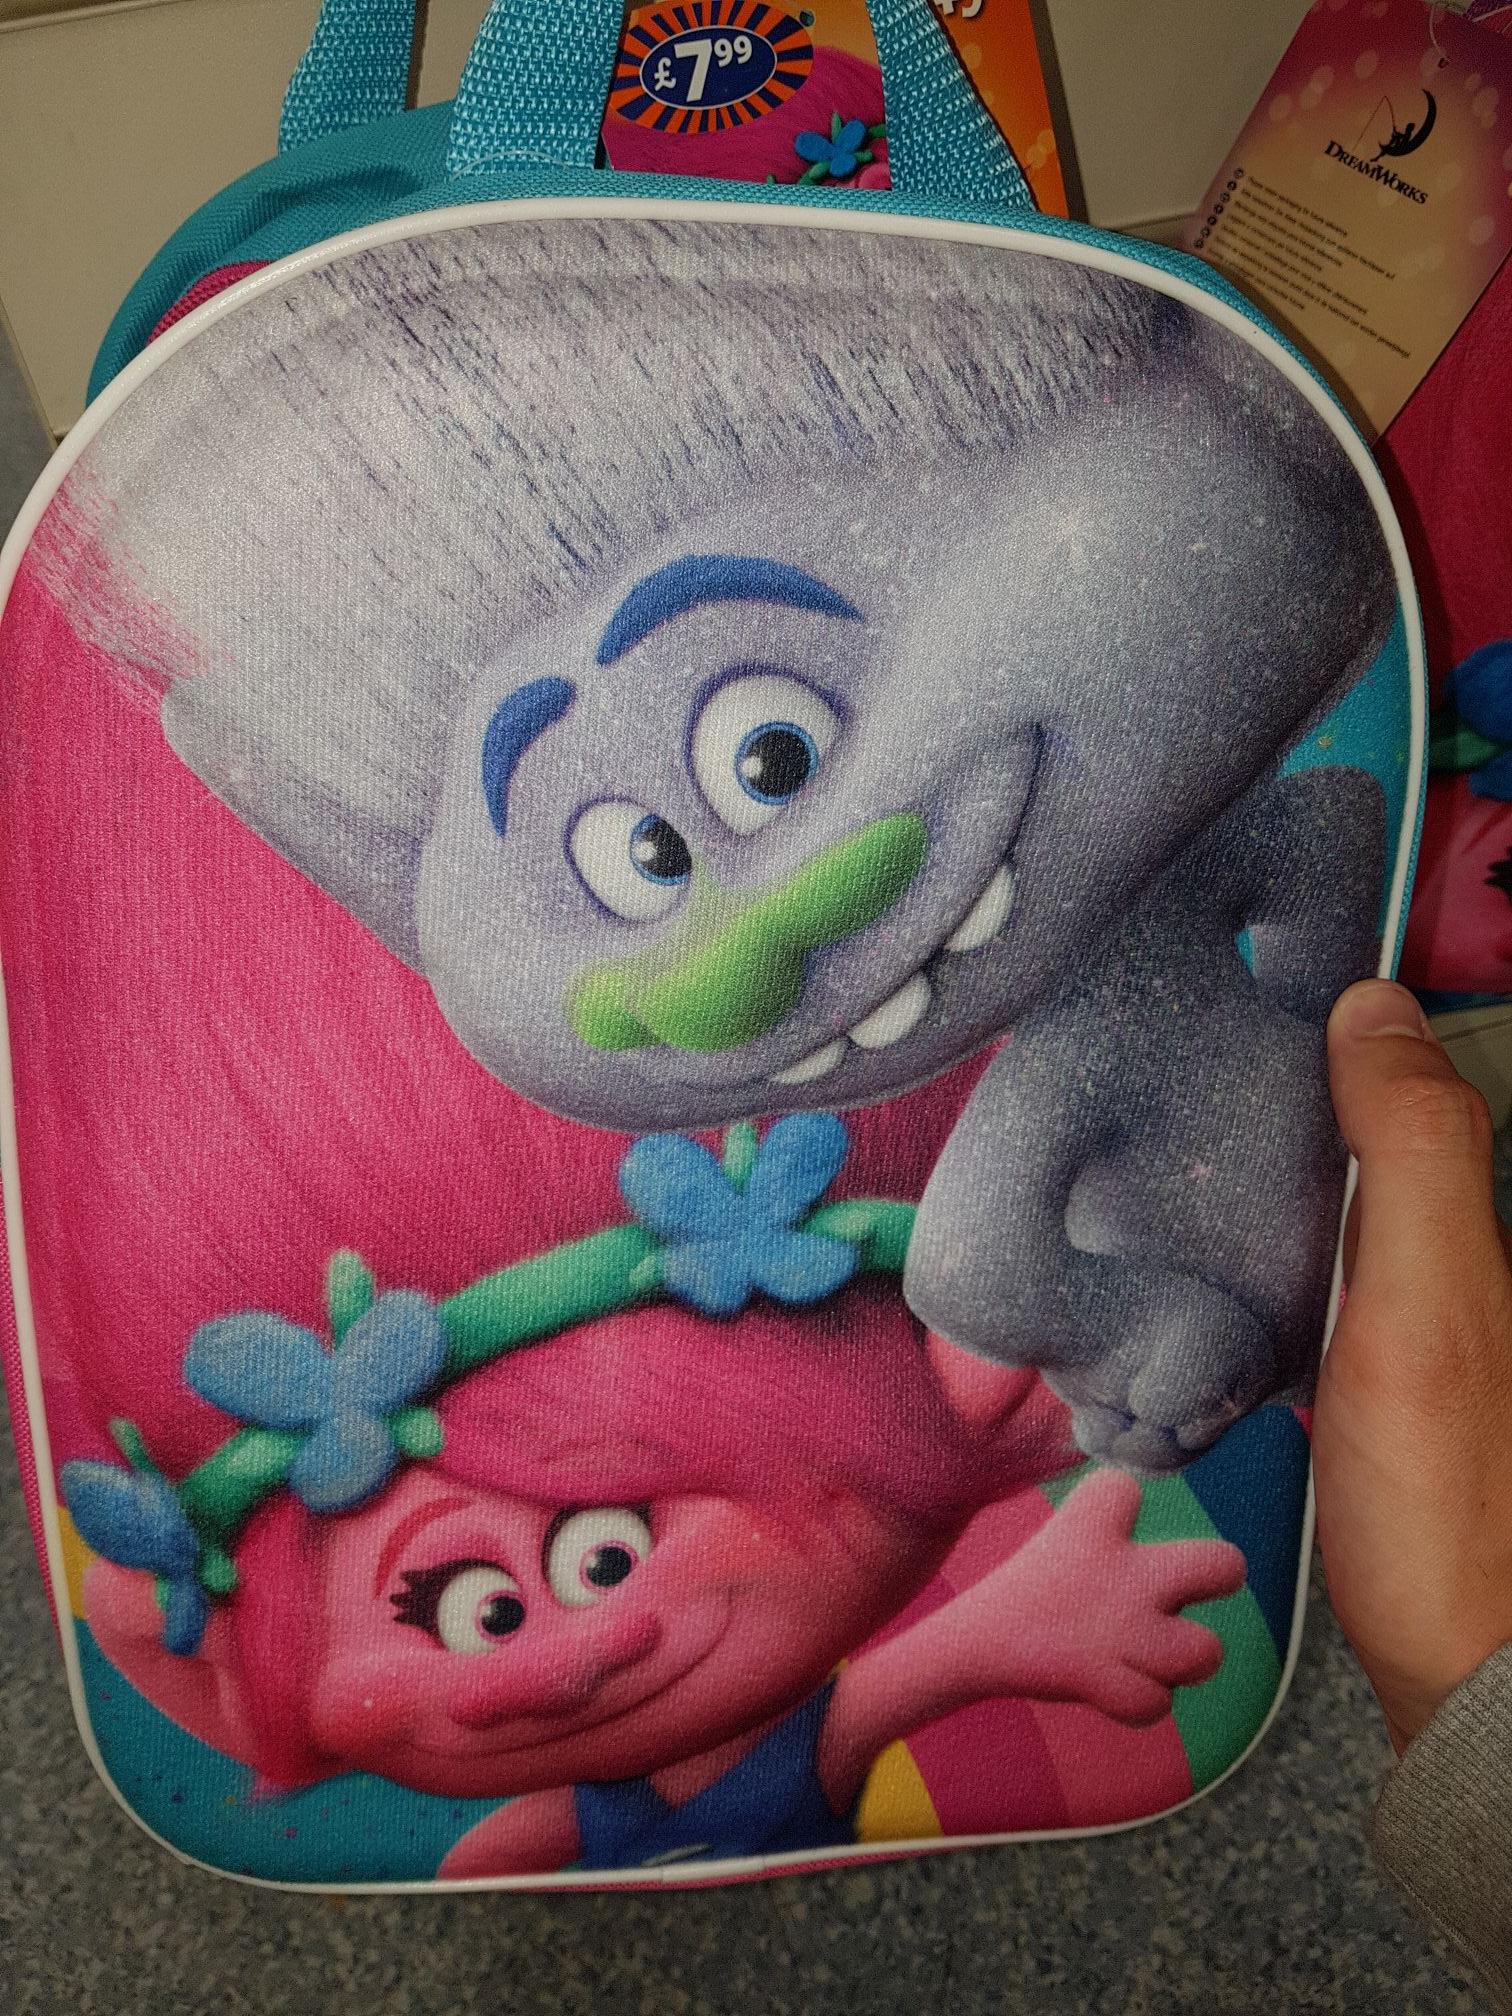 TROLL 3D backpack @ B&M - £1